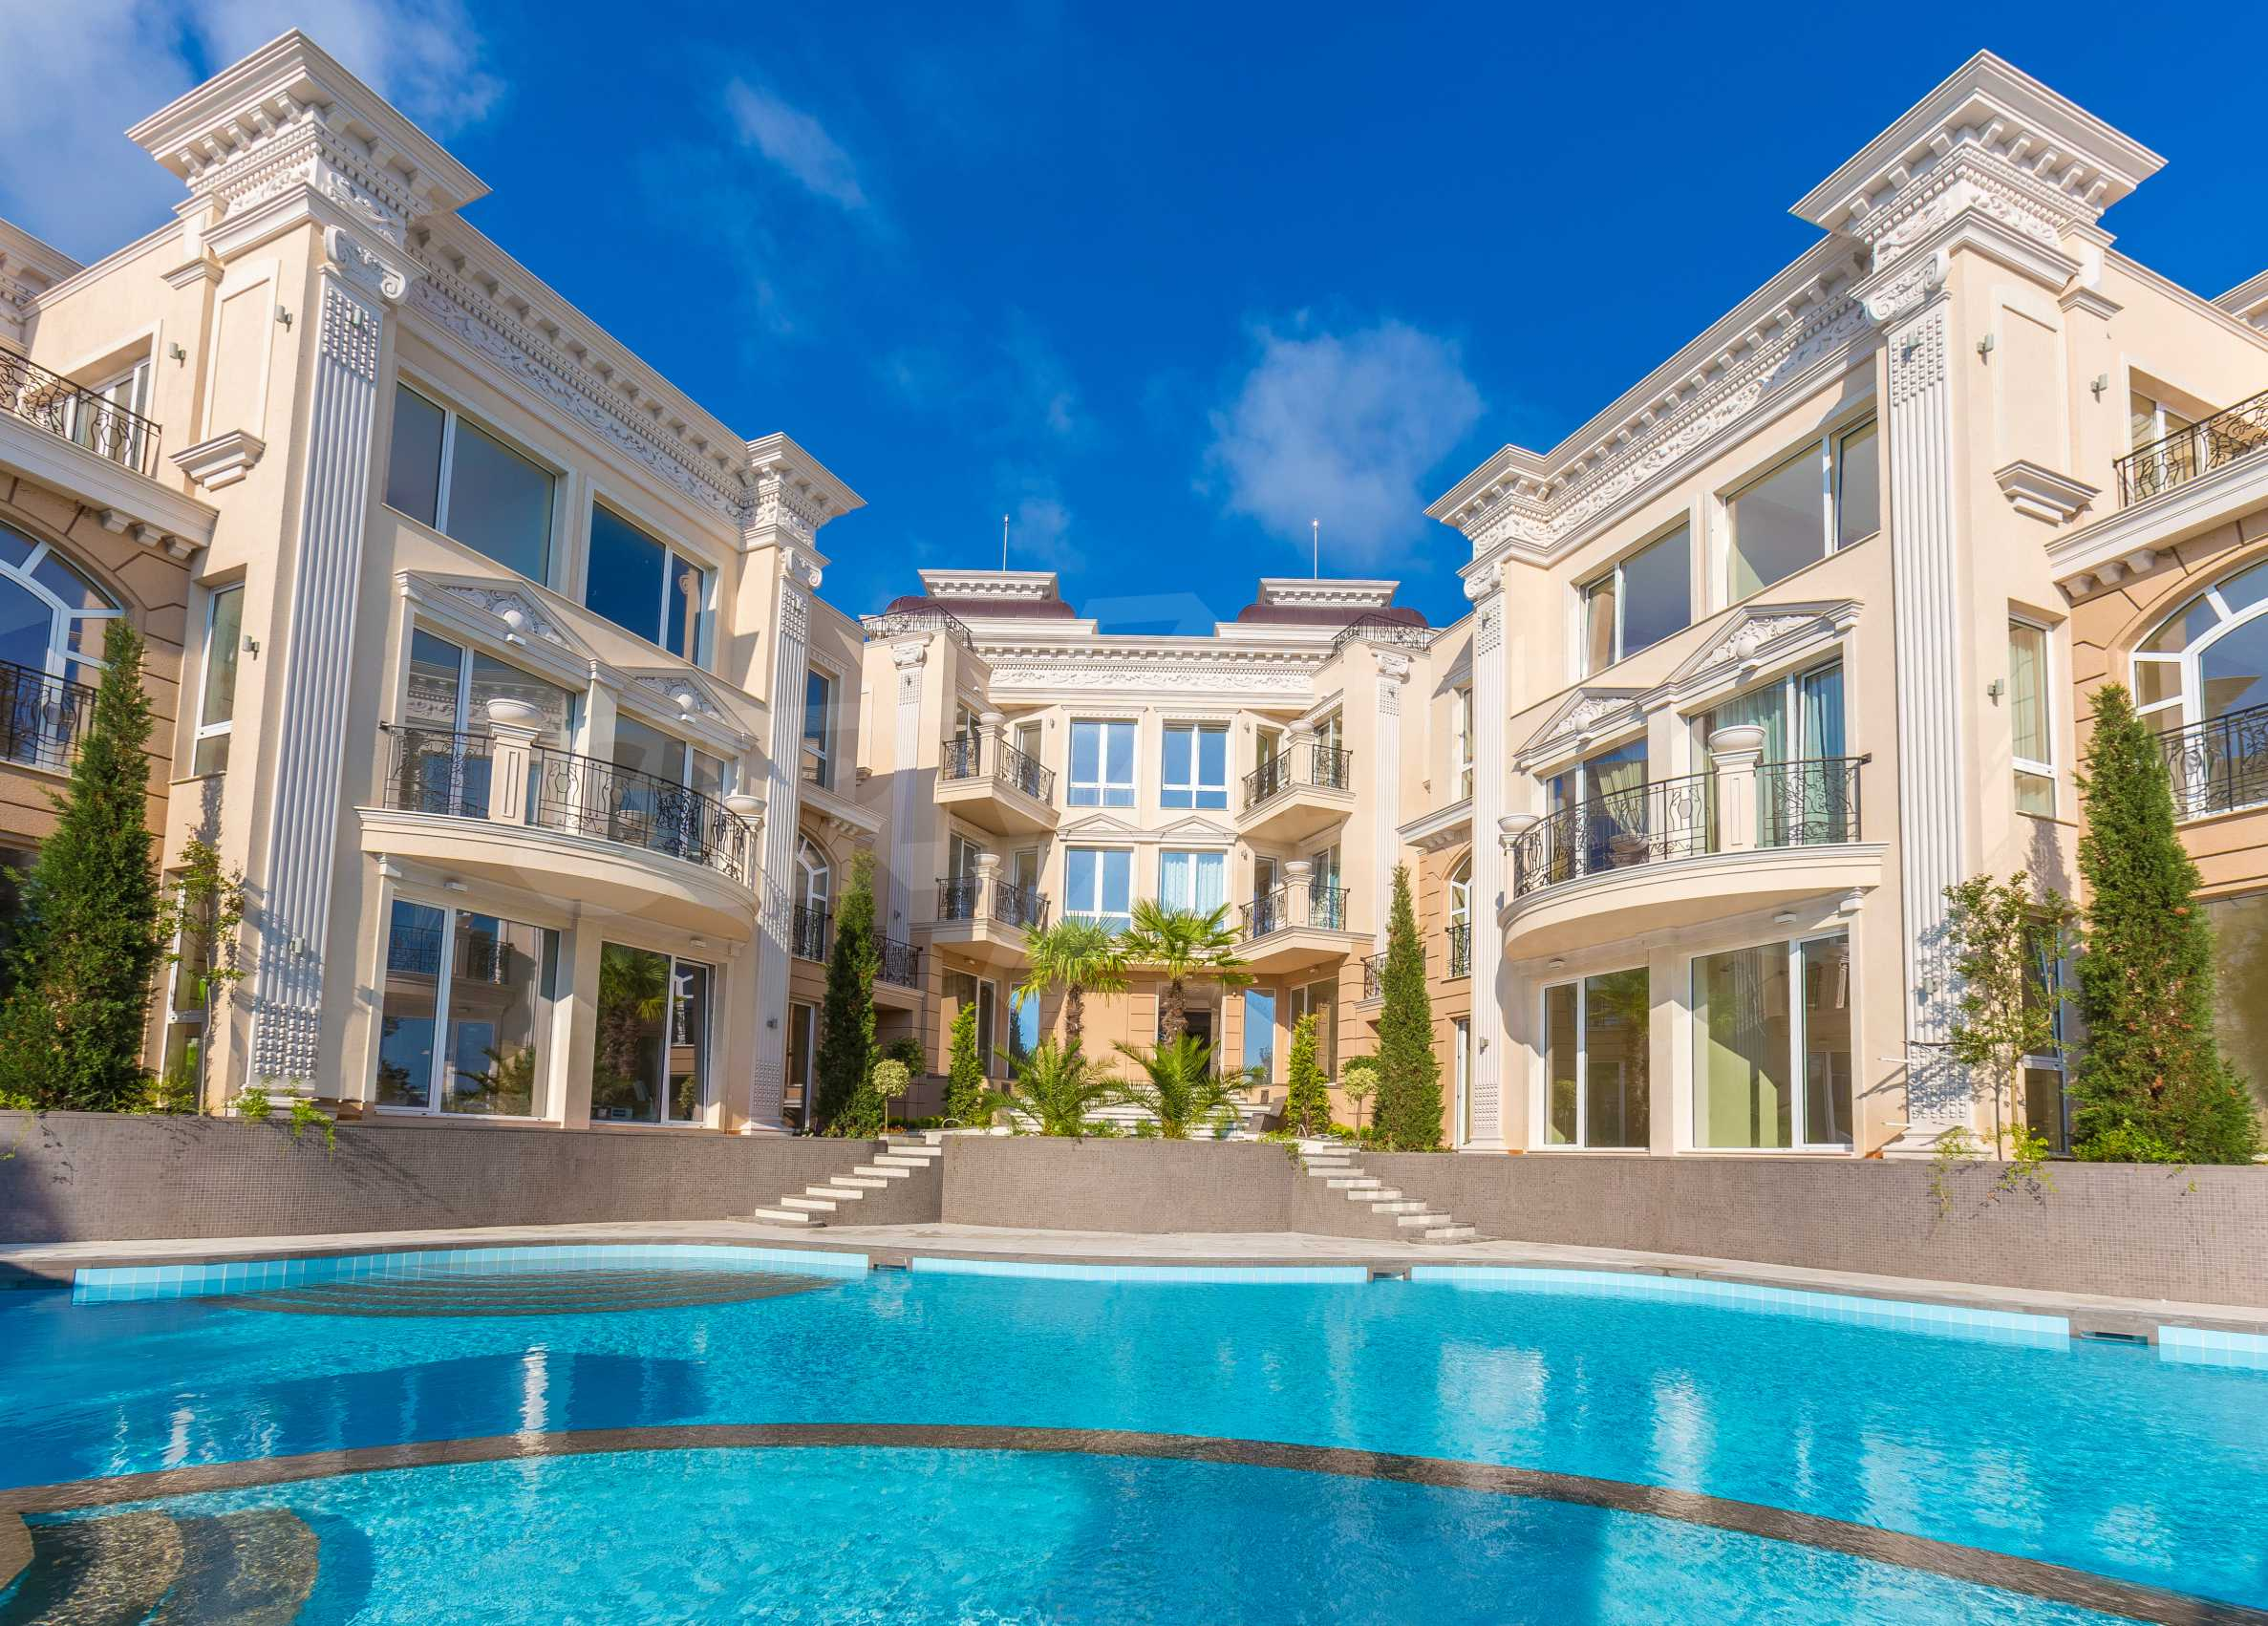 Комфортен двустаен апартамент под наем в Belle Époque Beach Residence, курорт Лозенец 30